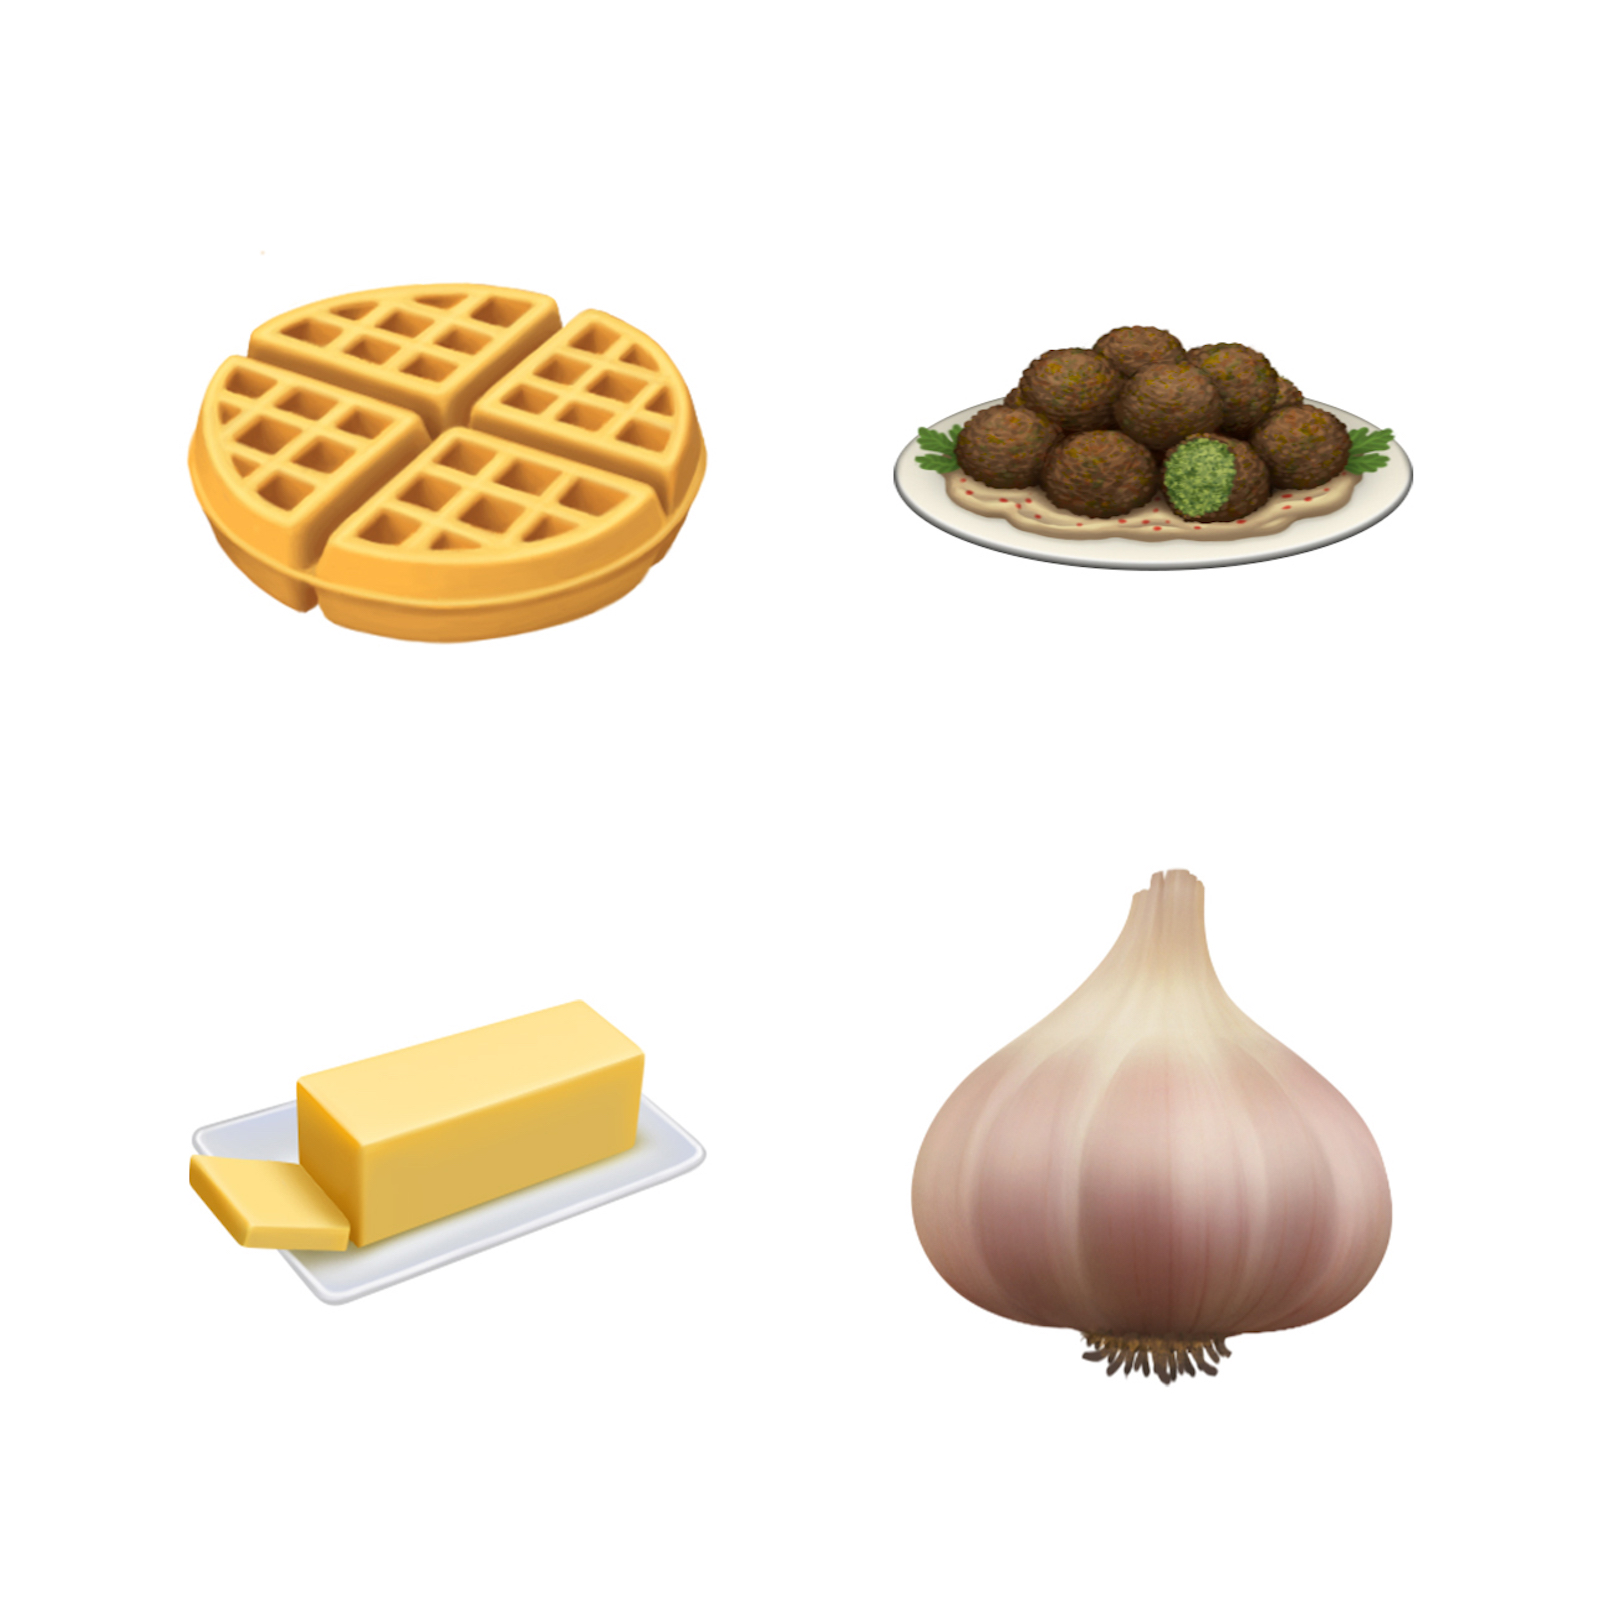 New emoji coming this fall